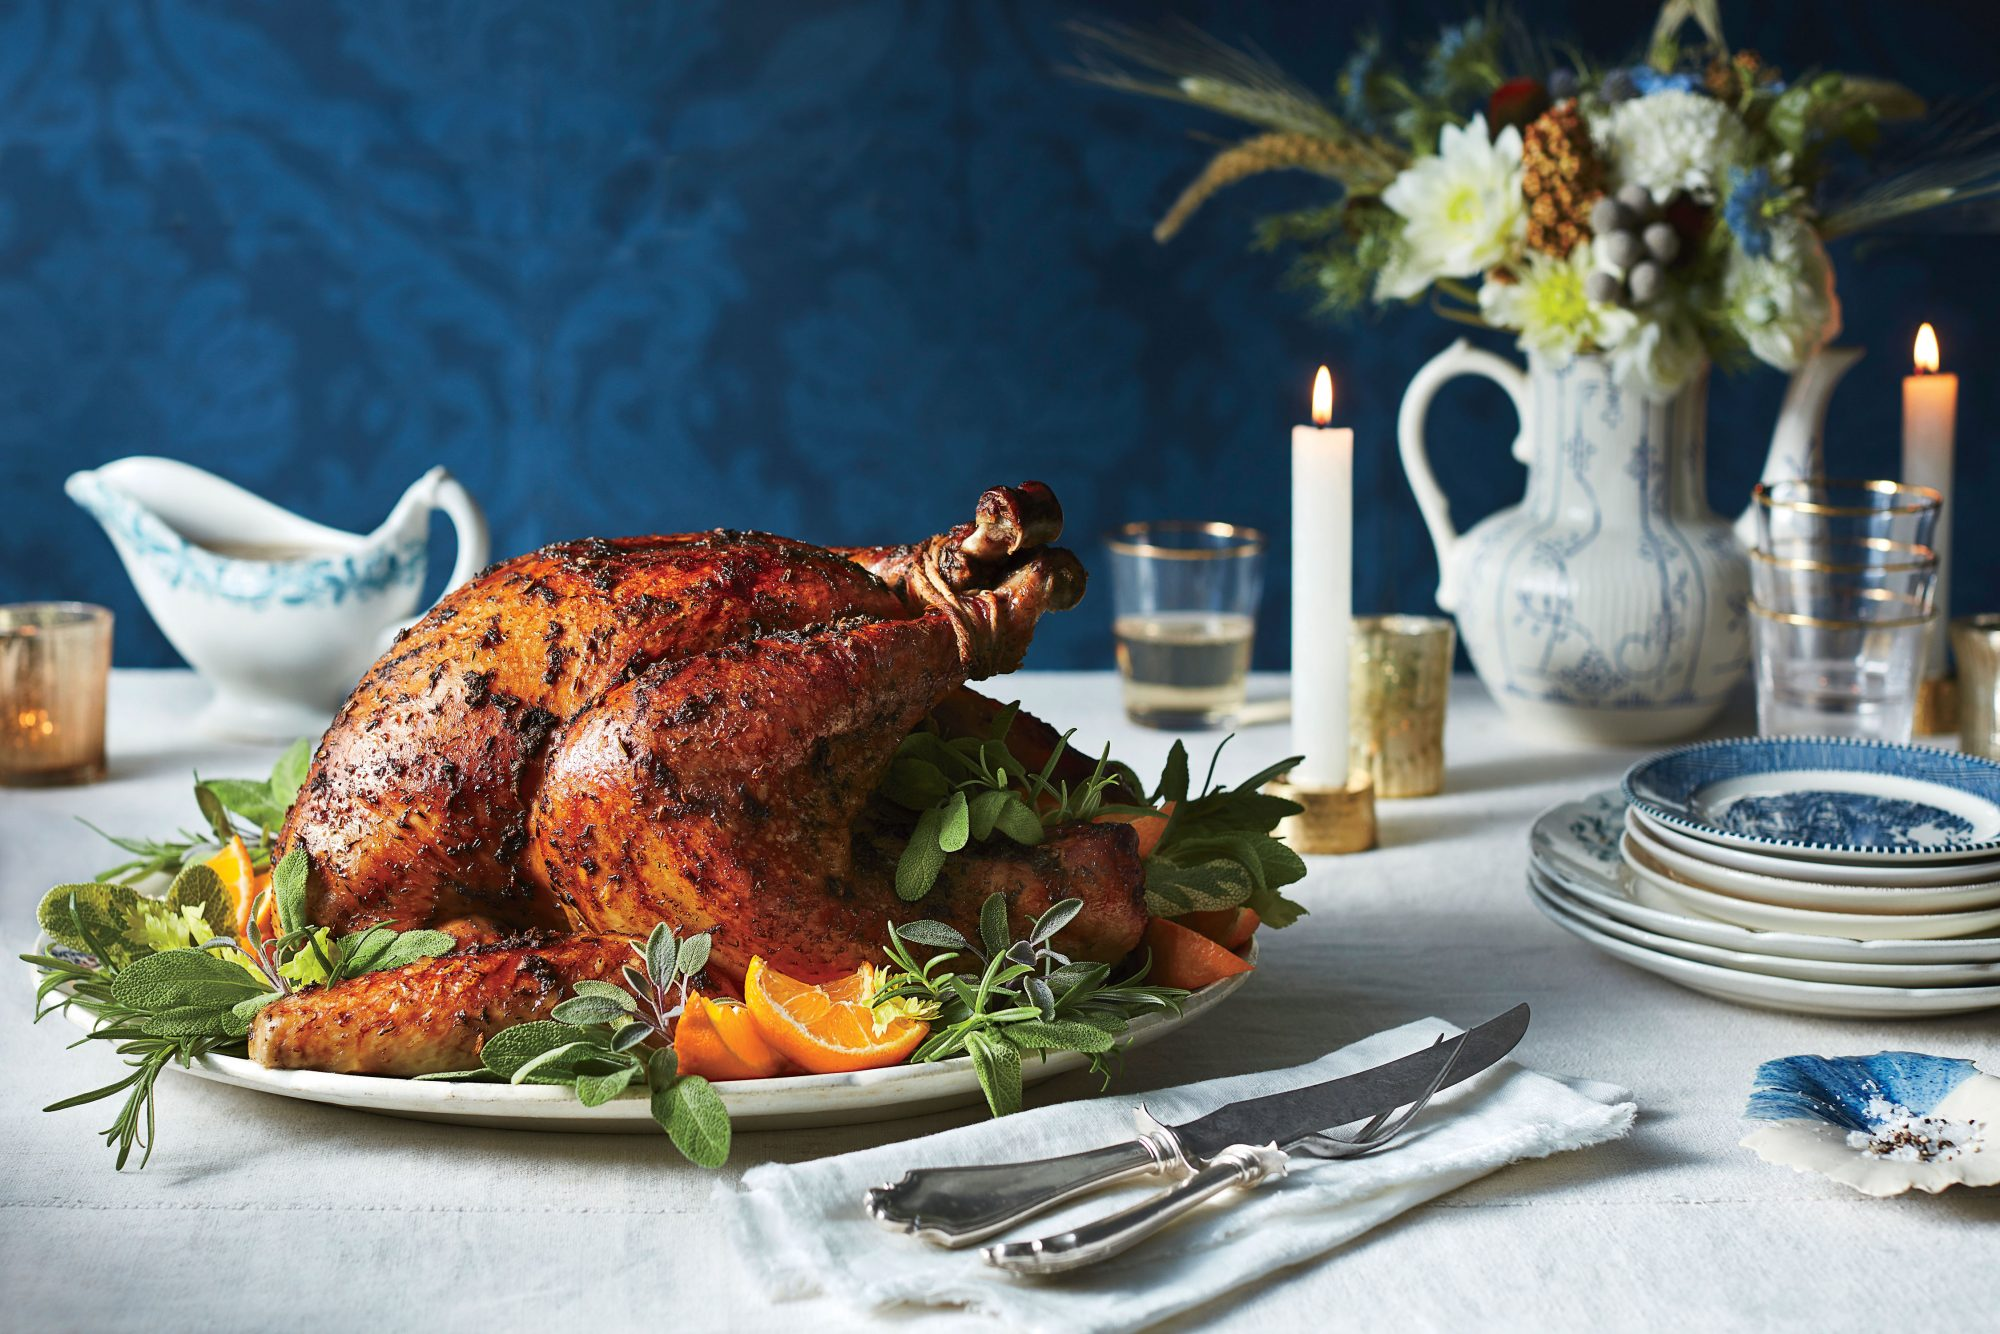 Roasted Herb Turkey and Gravy